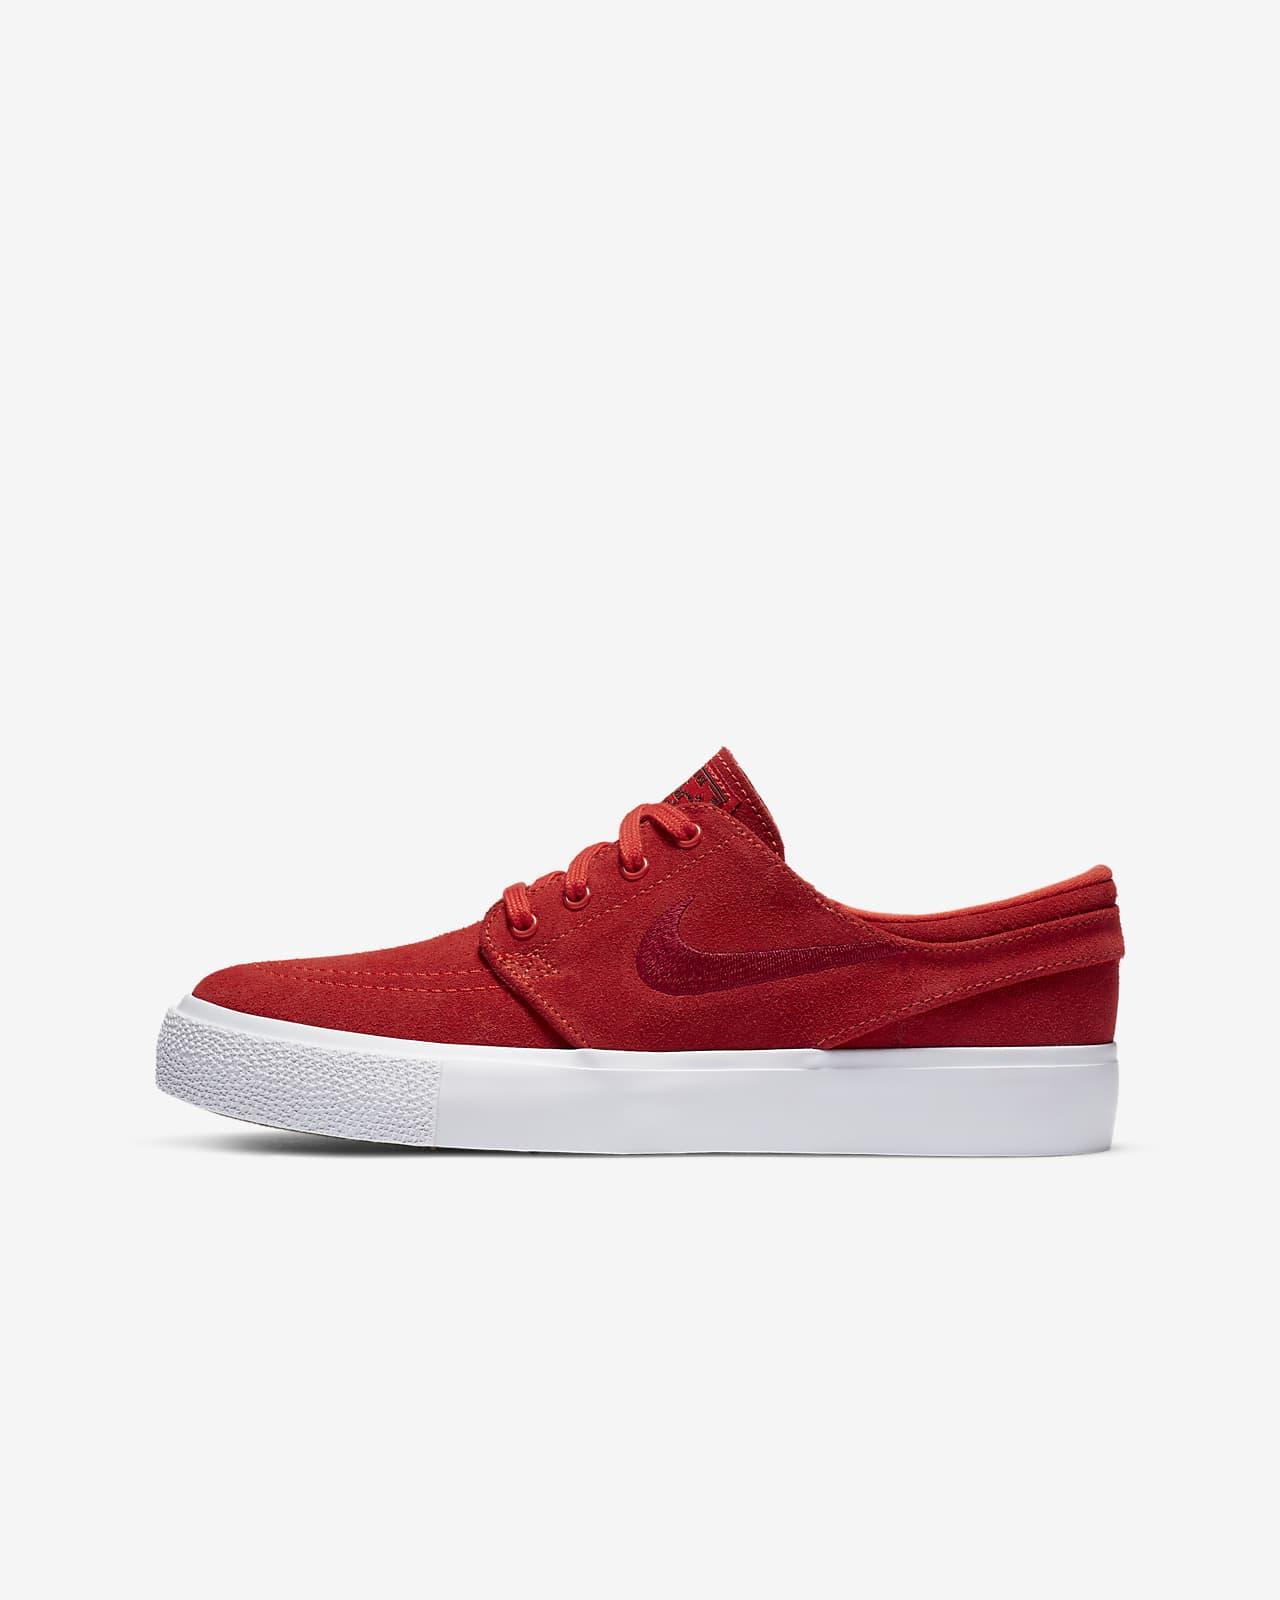 Nike SB Stefan Janoski Zapatillas de skateboard - Niño/a